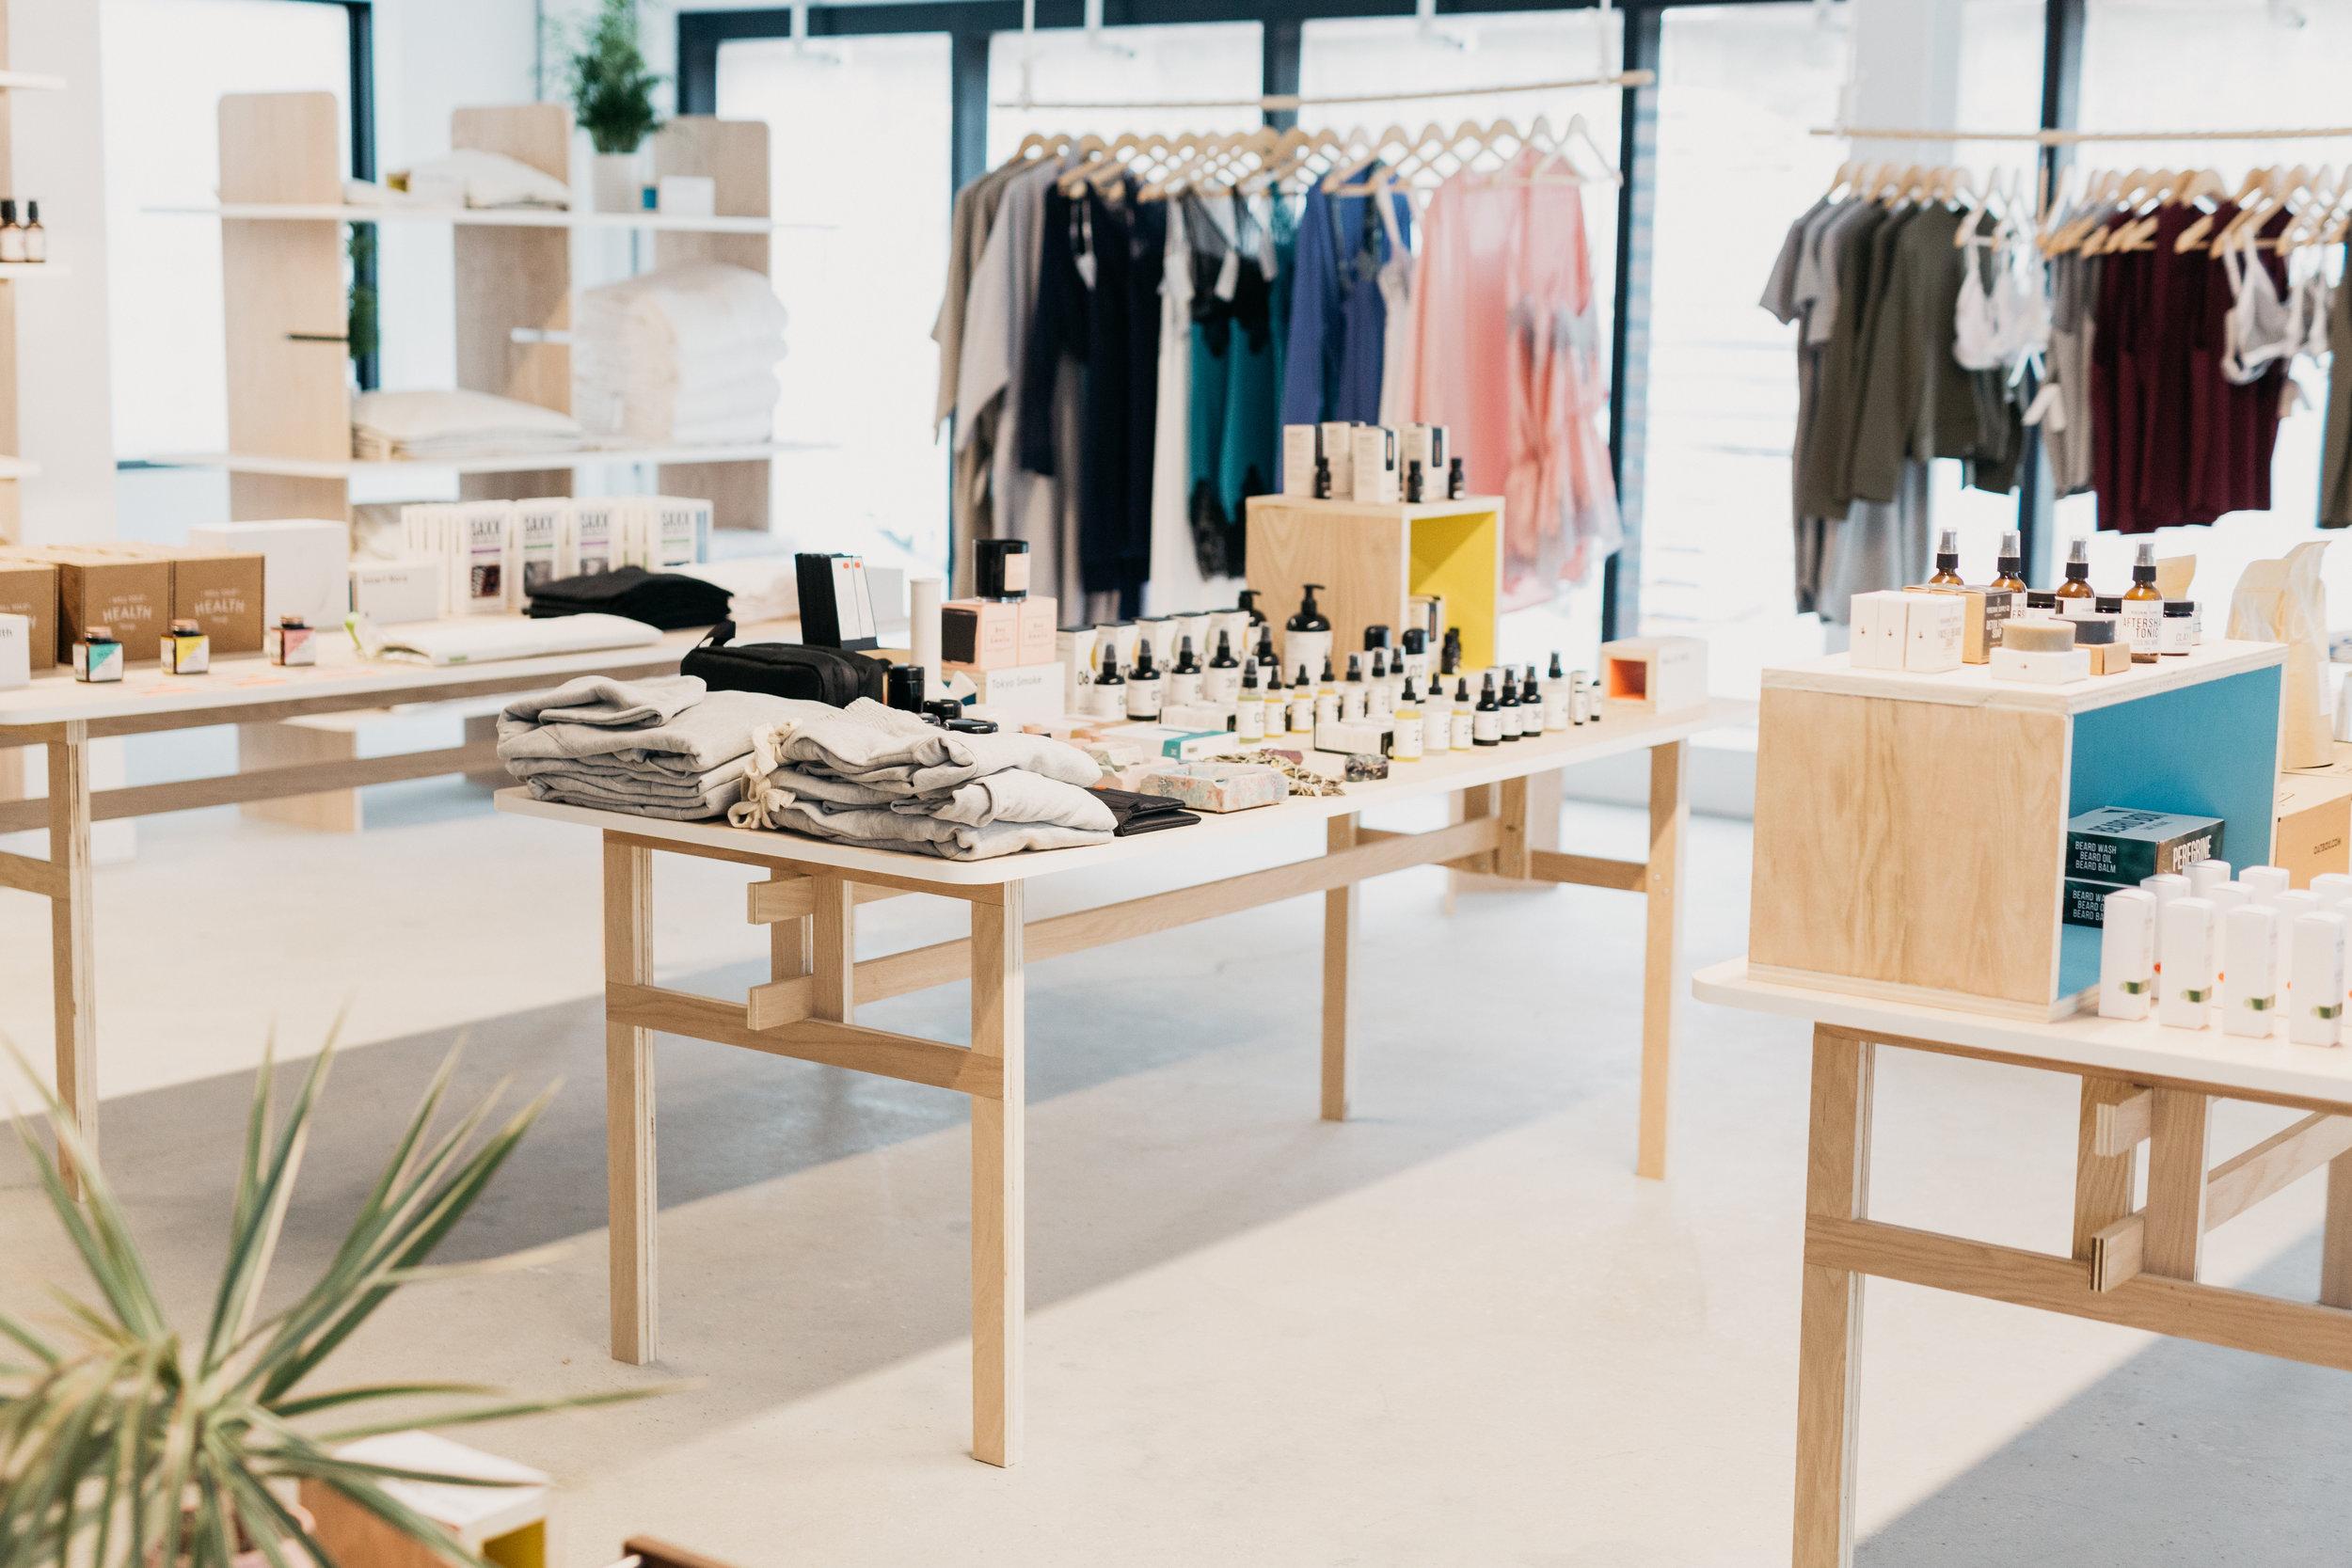 thisopenspace : Fixture Design